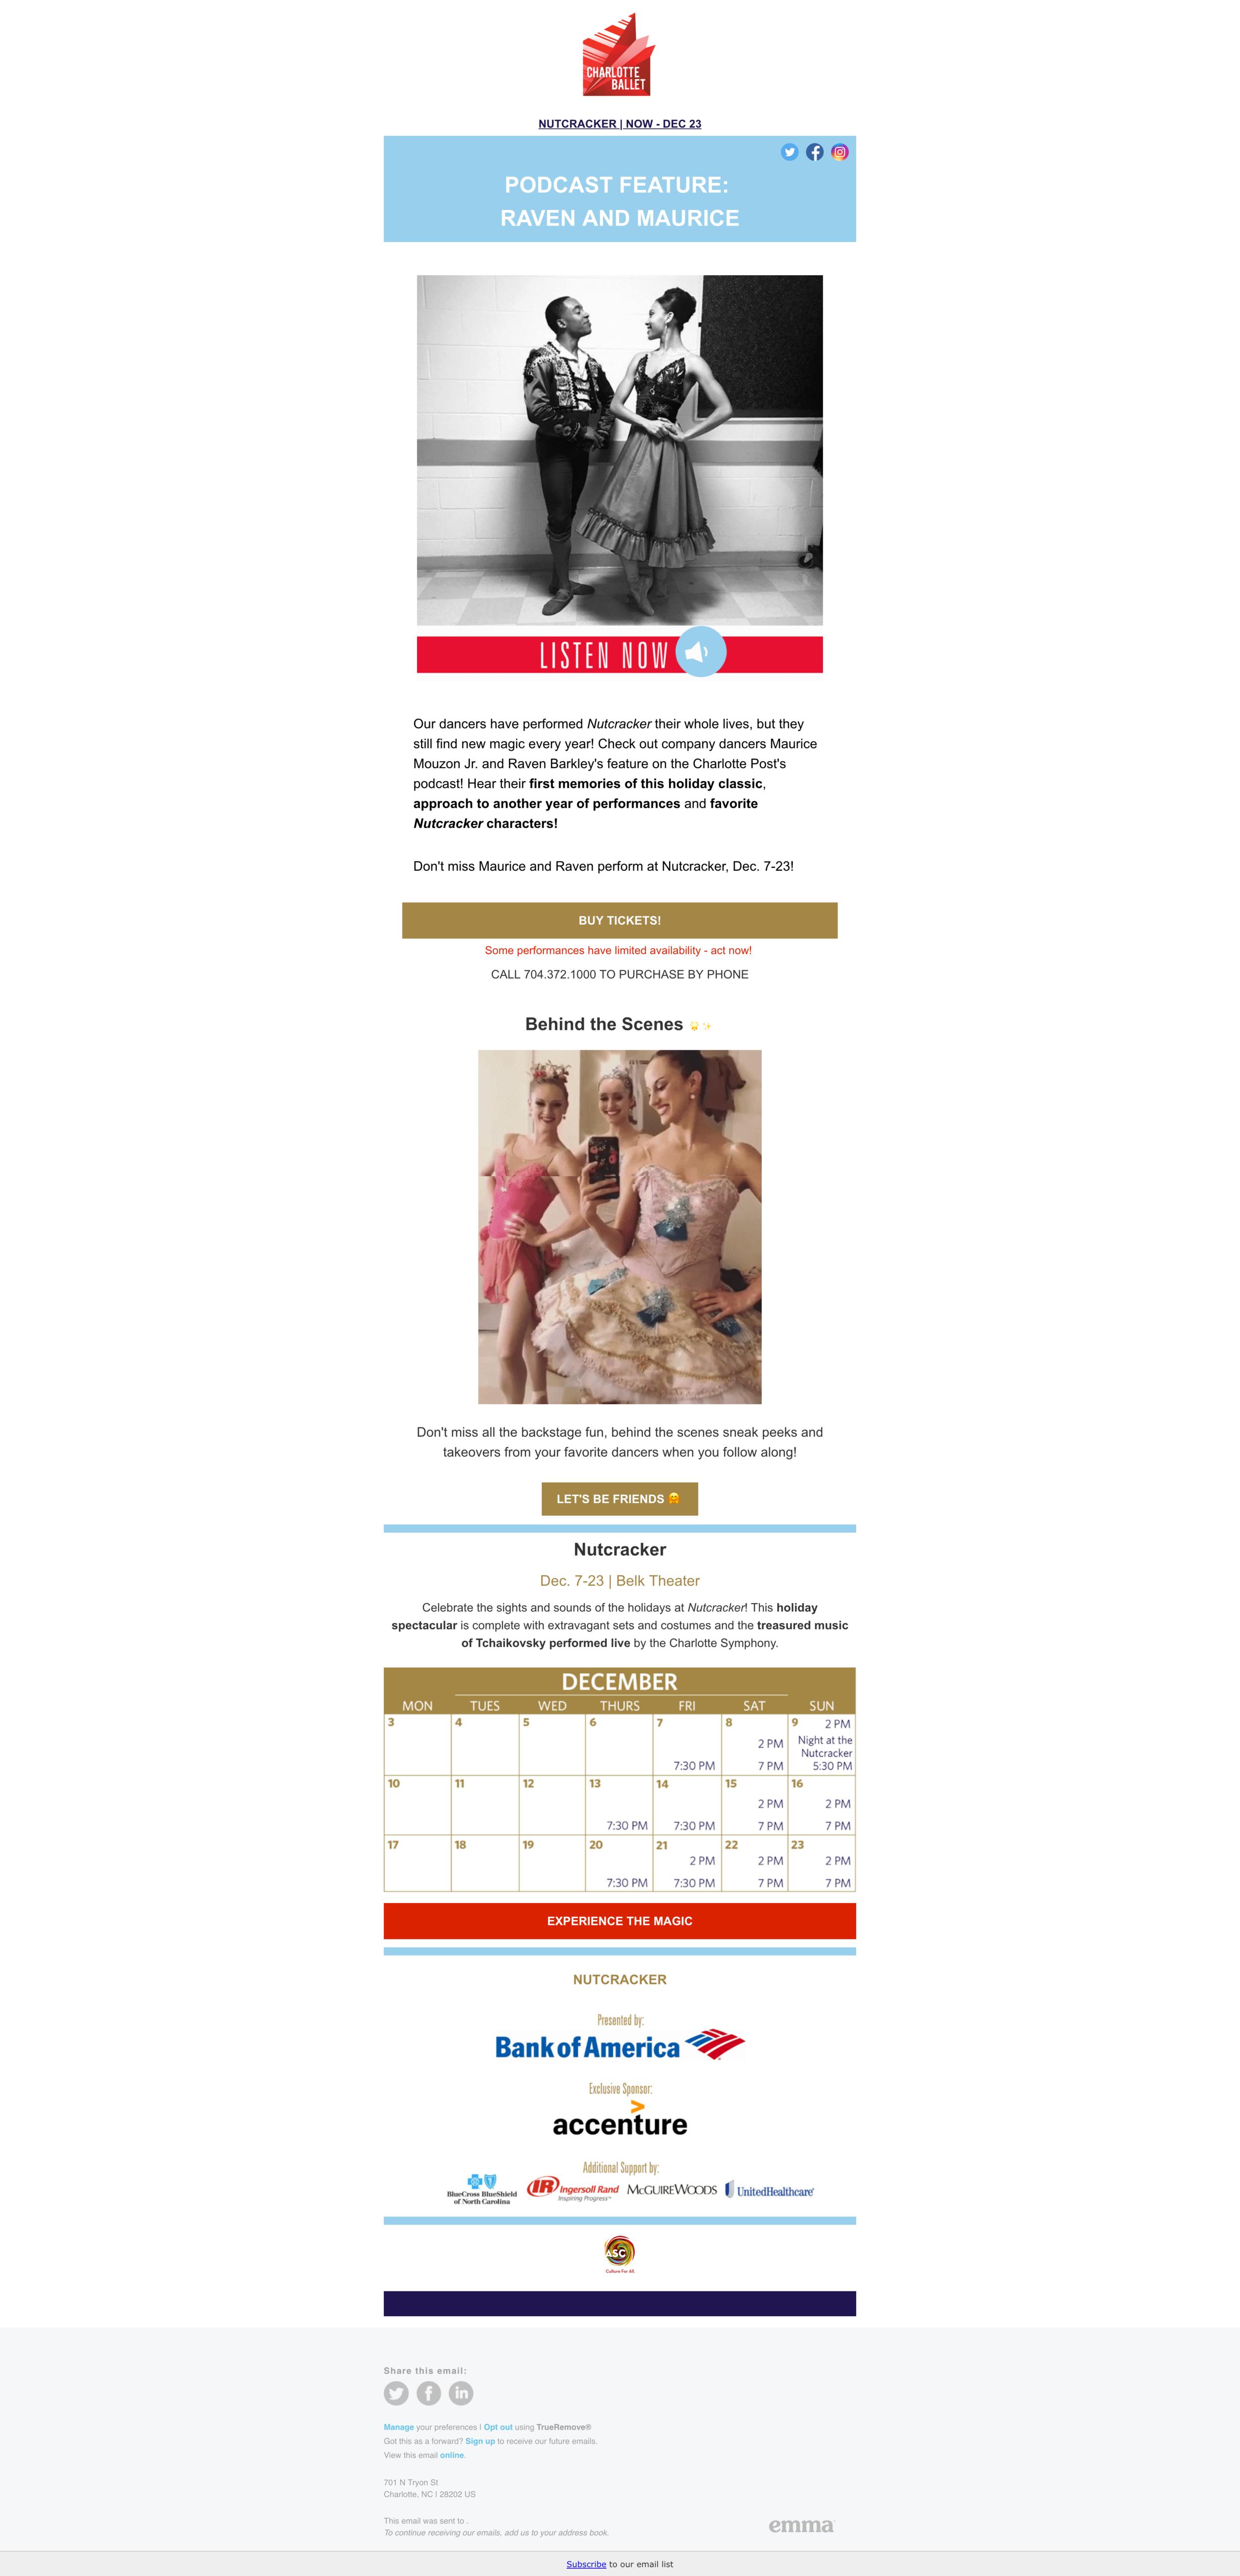 screencapture-t-e2ma-net-webview-l2n2ue-f28b6393b1a44d32c8190215041093d5-2019-04-14-11_48_18.png